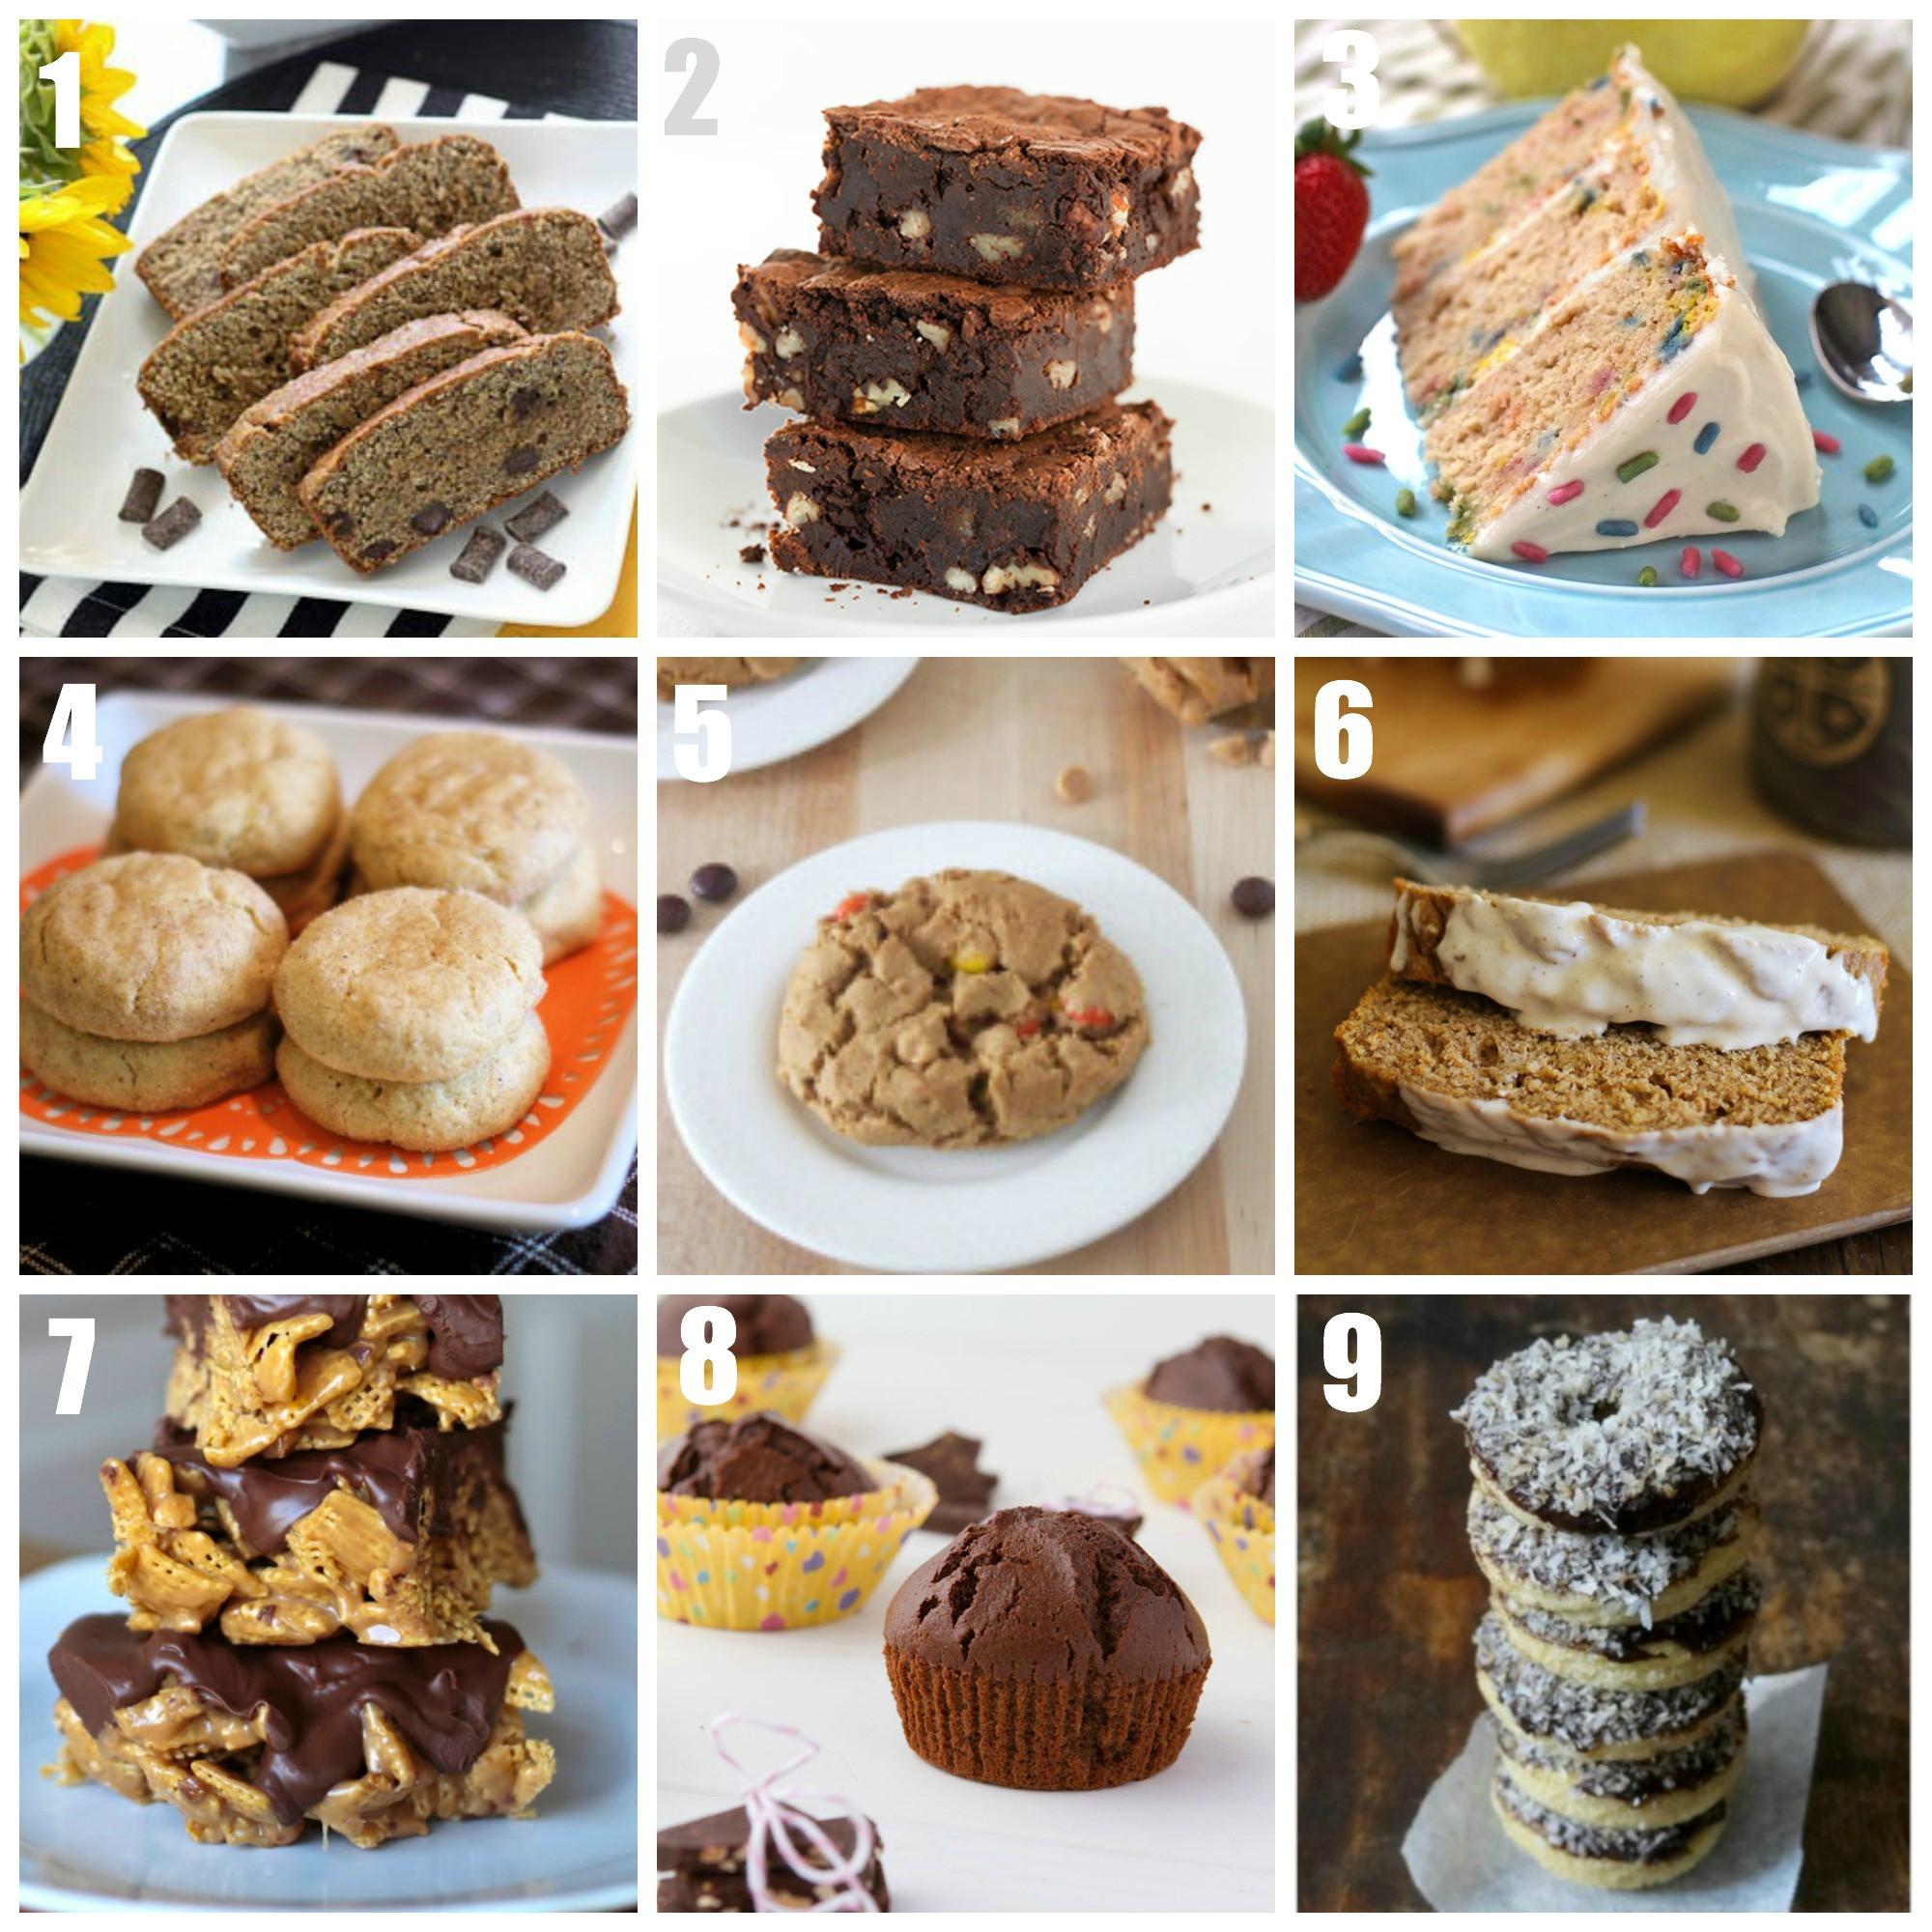 Gluten Free Dairy Free Dessert Recipes  Easy Gluten Free Dessert Recipes